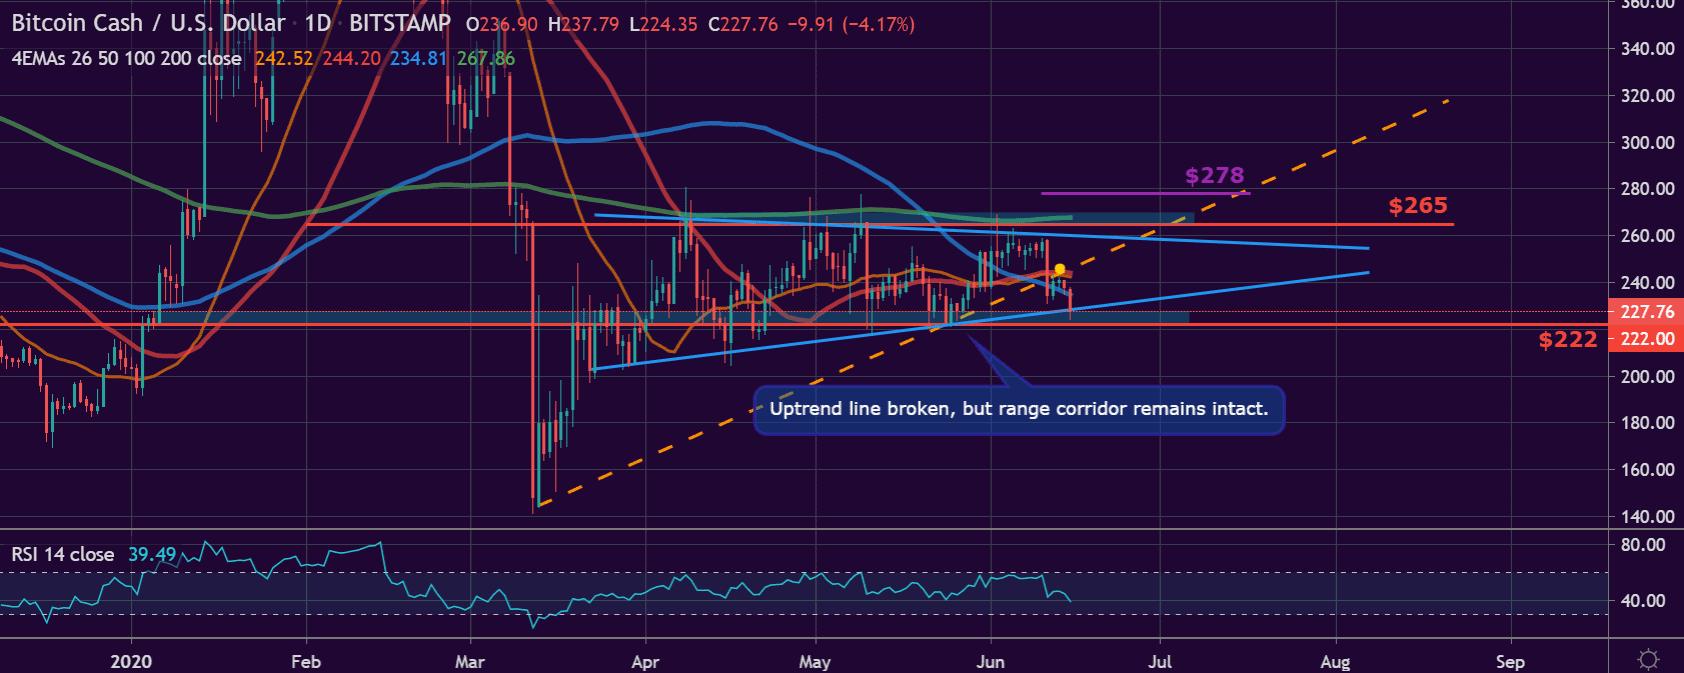 Bitcoin Cash price chart 2 - 15 June